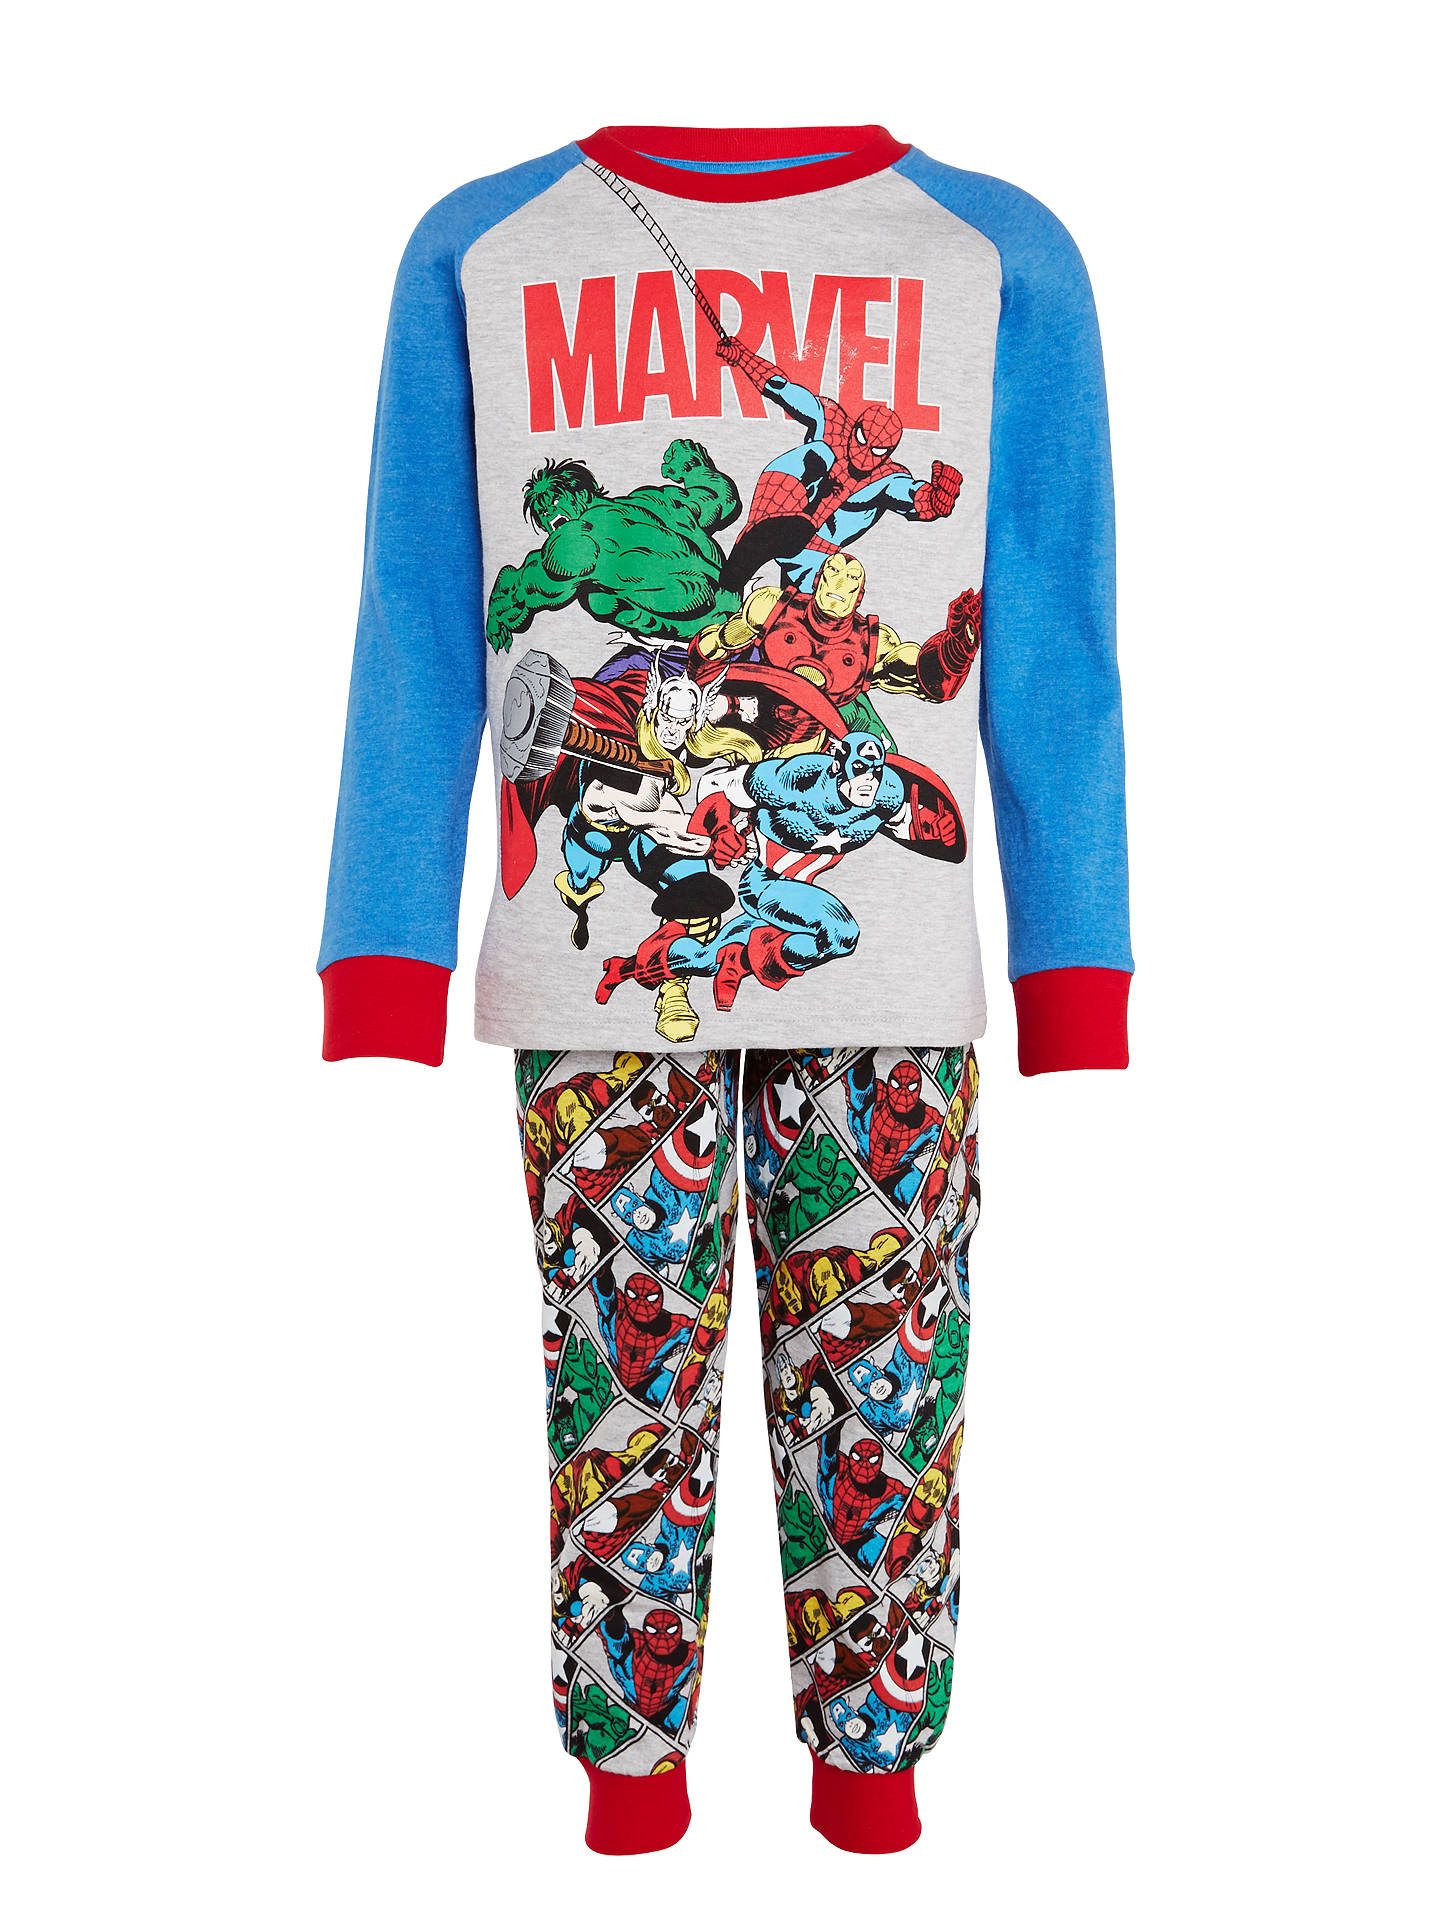 BuyMarvel Children s Pyjamas 4fd5f4905